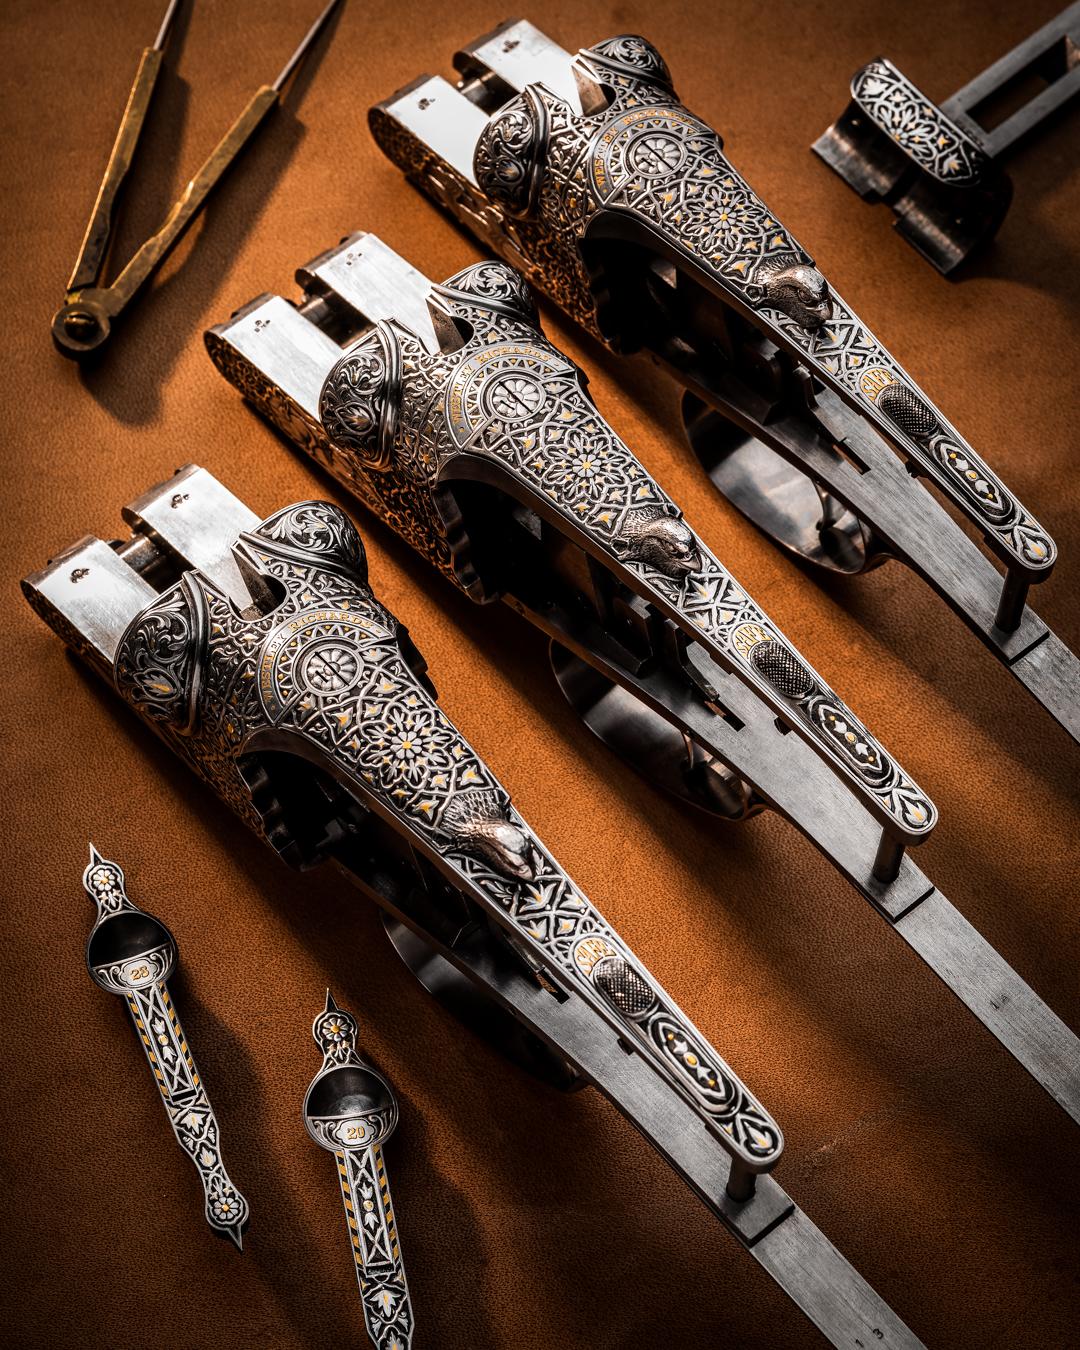 WR - The Falcon Trio - Engraving-4277-Edit-Edit